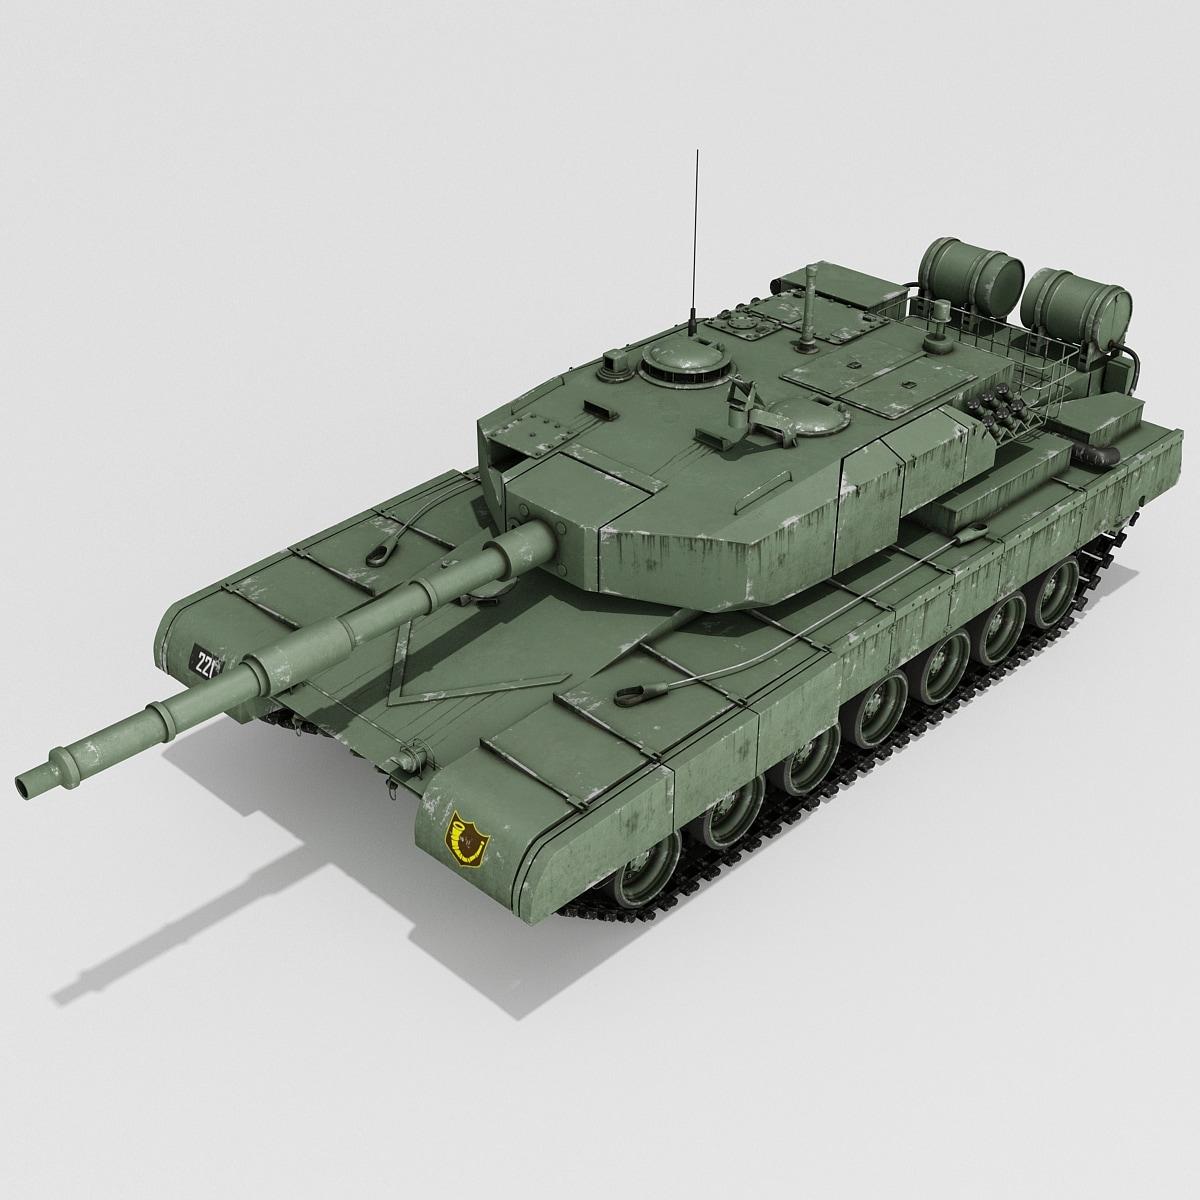 127352_Arjun_India_Main_Battle_Tank_2_005.jpg